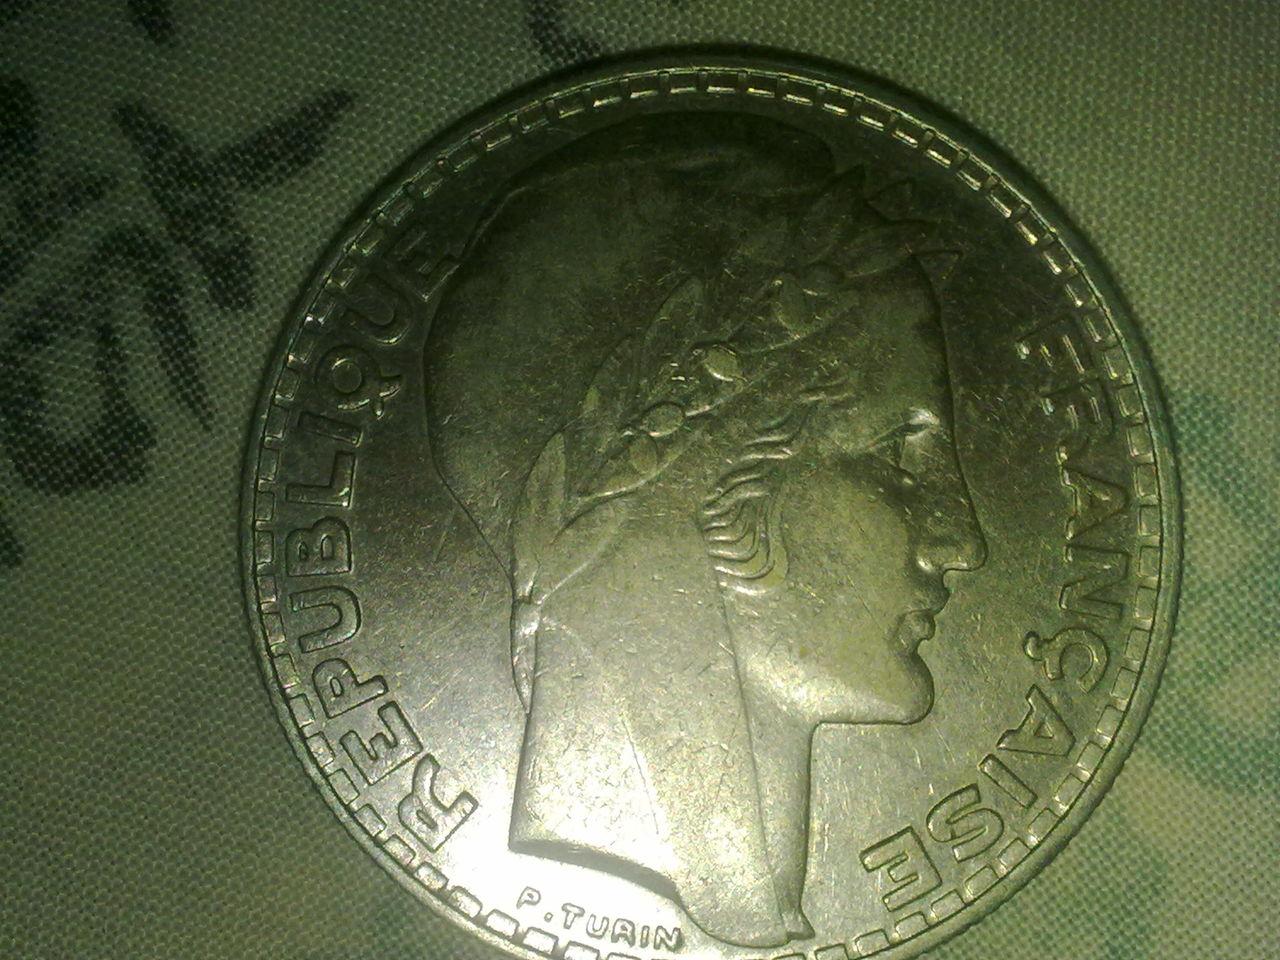 20 Francs. Francia. 1933. París Llllllllllllllllllllllllllllllllllllllll_002